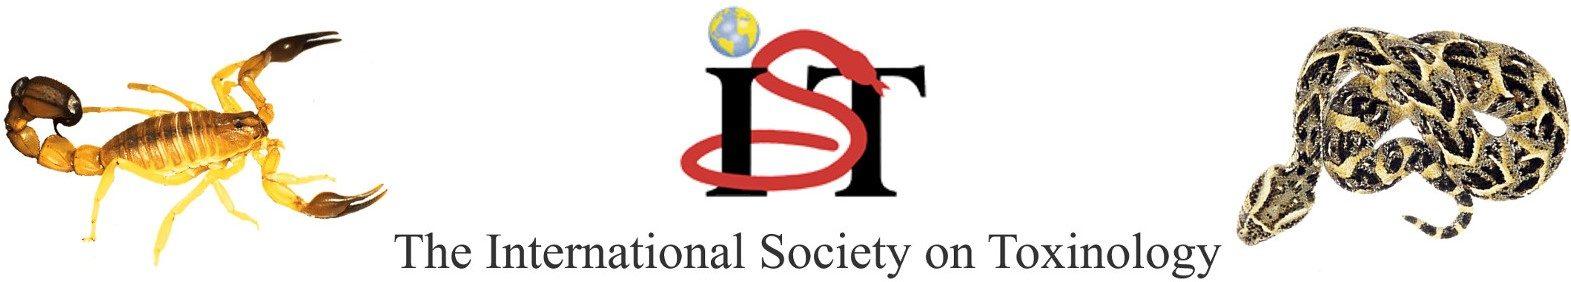 The International Society on Toxinology